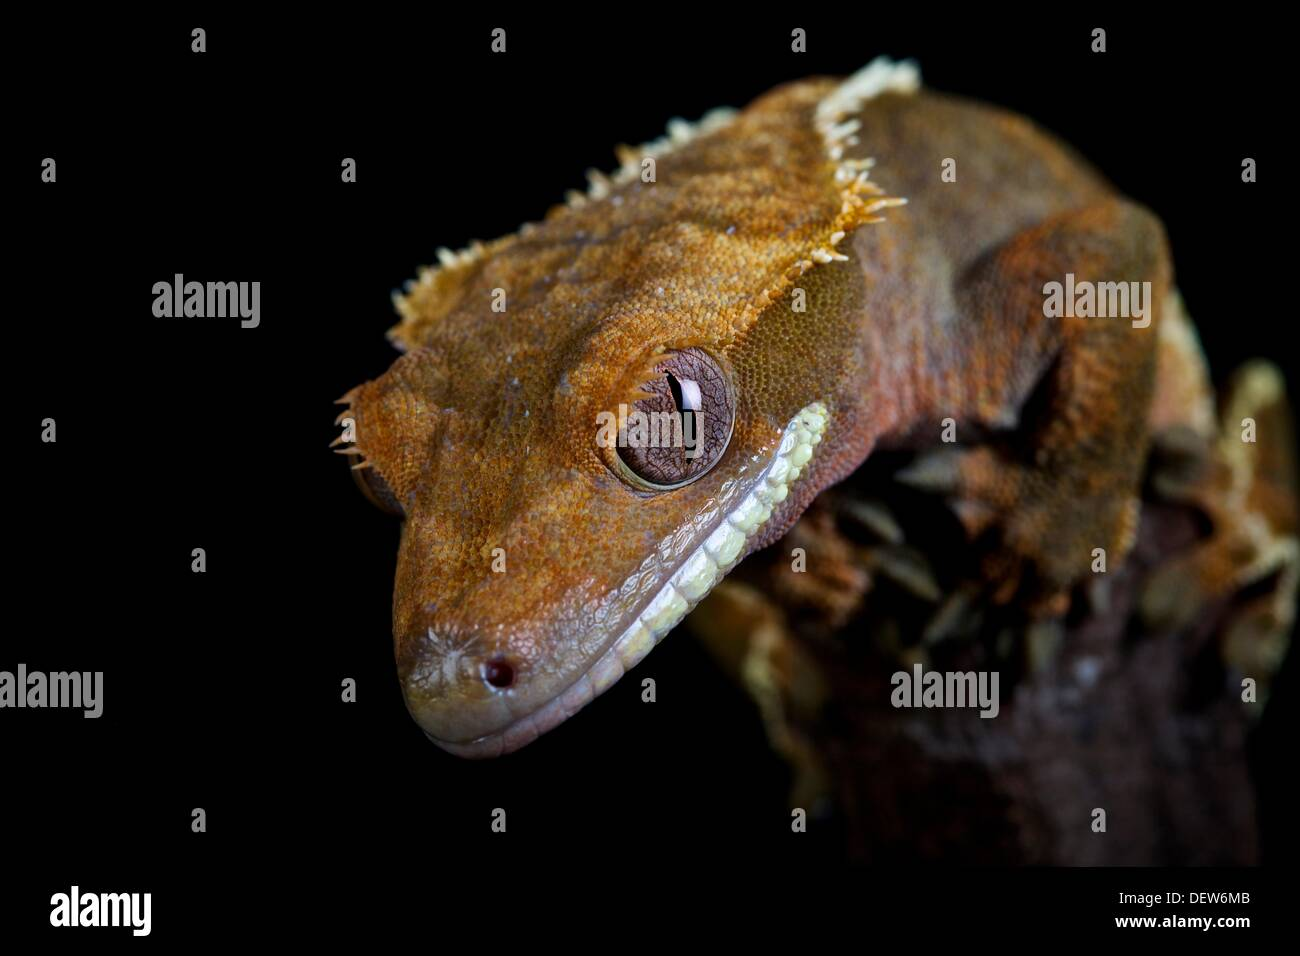 En cautiverio, Colección Privada Crested Gecko Foto de stock